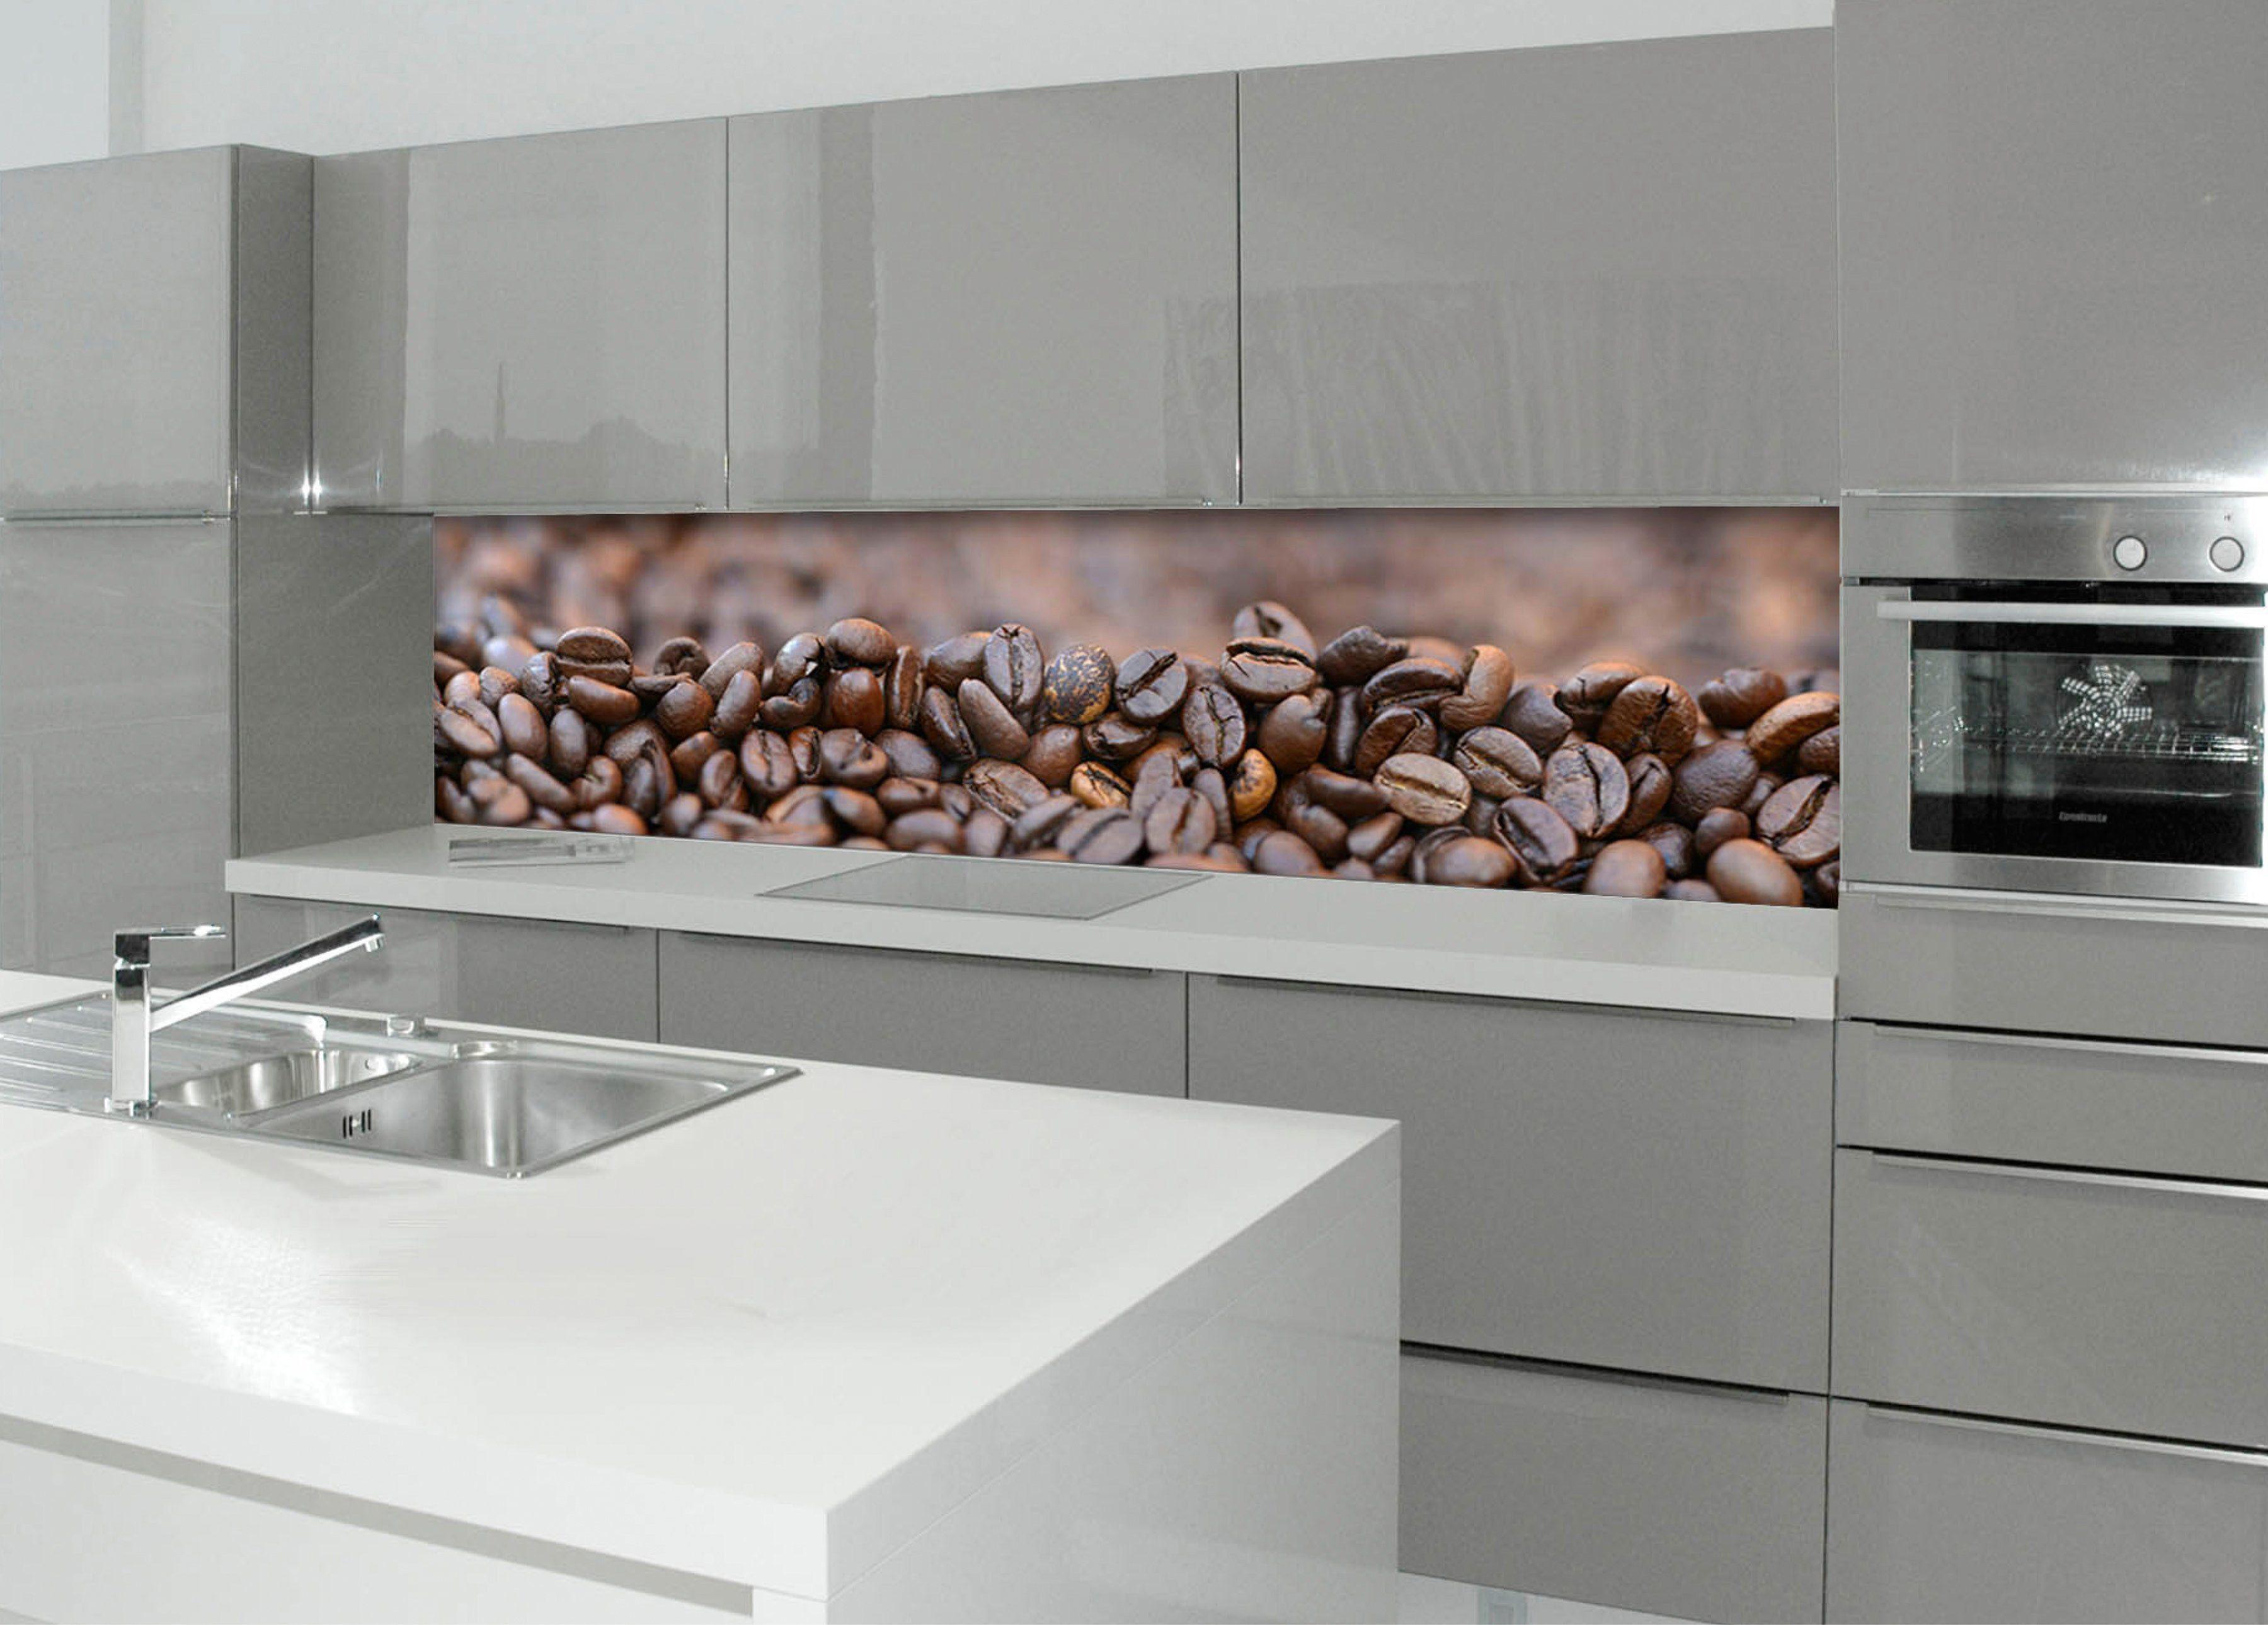 Küchenrückwand - Spritzschutz »profix«, Kafeebohnen, 220x60 cm